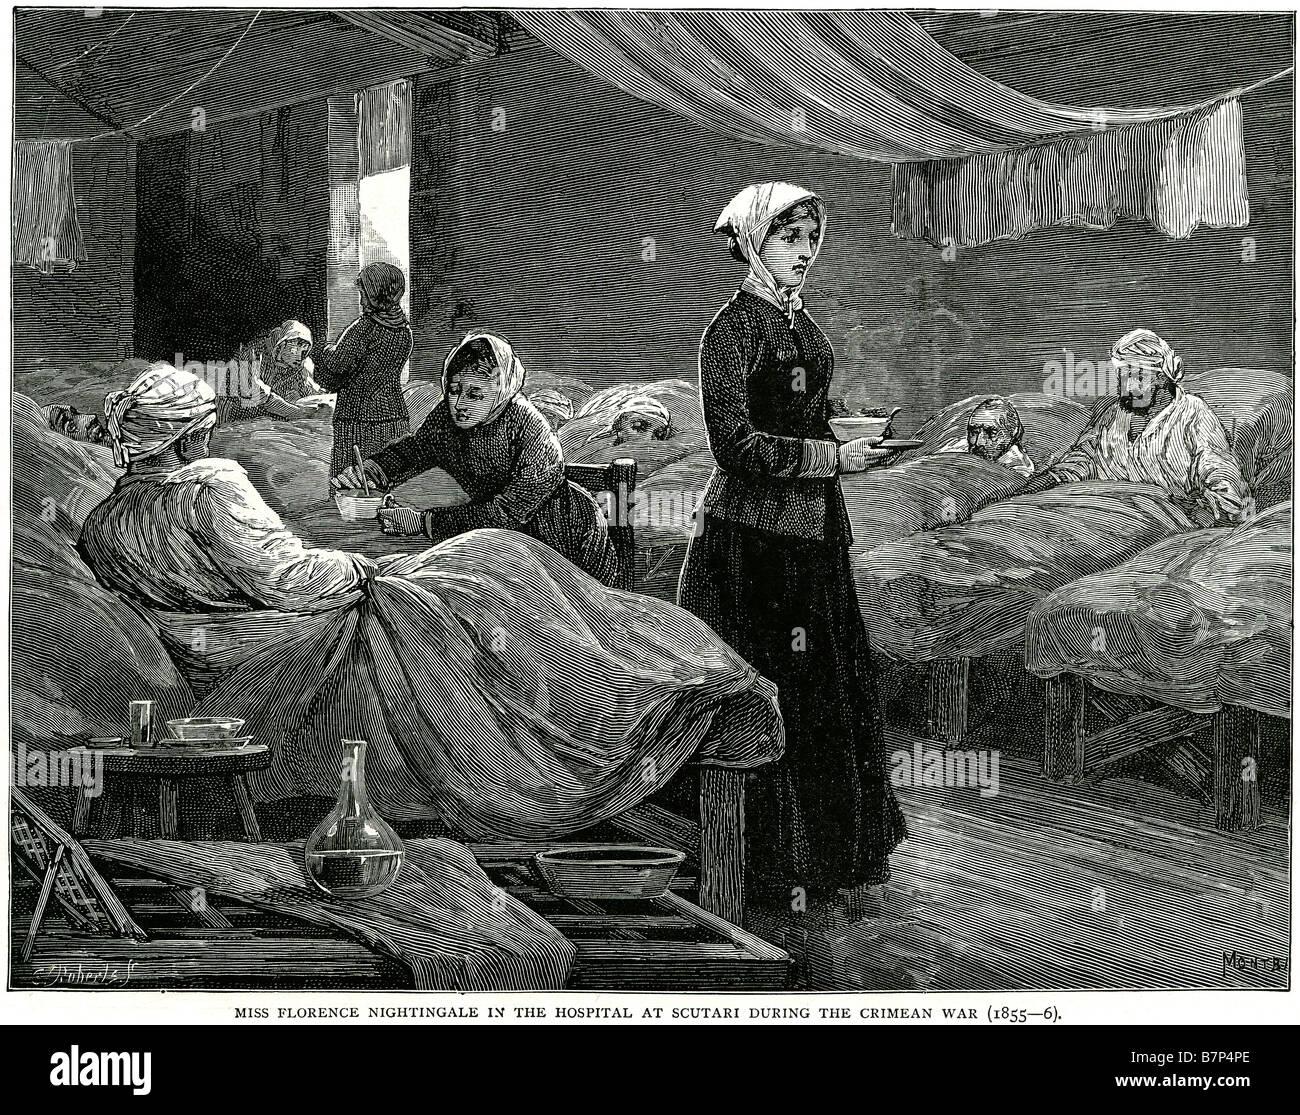 miss florence nightingale hospital scutari during crimean war 1855 ...